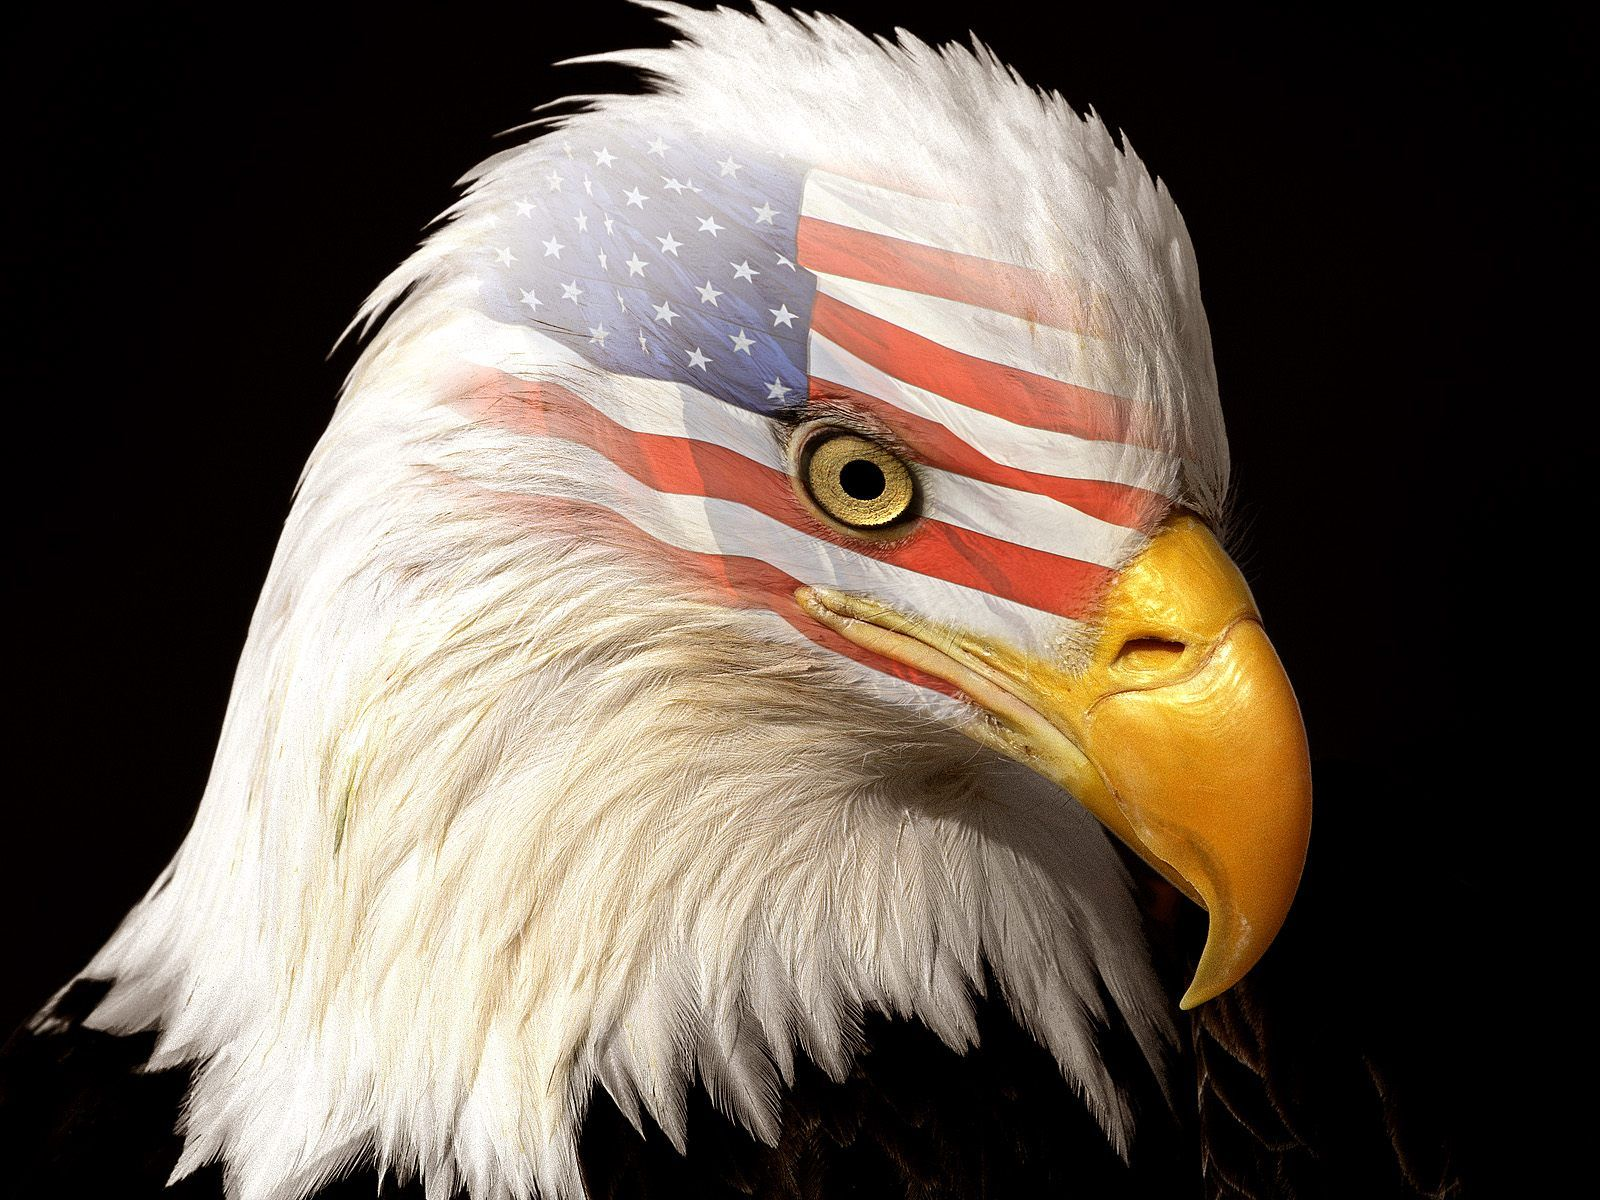 Fantastic Wallpaper Horse Eagle - 80df97b863cfda83177ef17674055dd4  You Should Have_312474.jpg